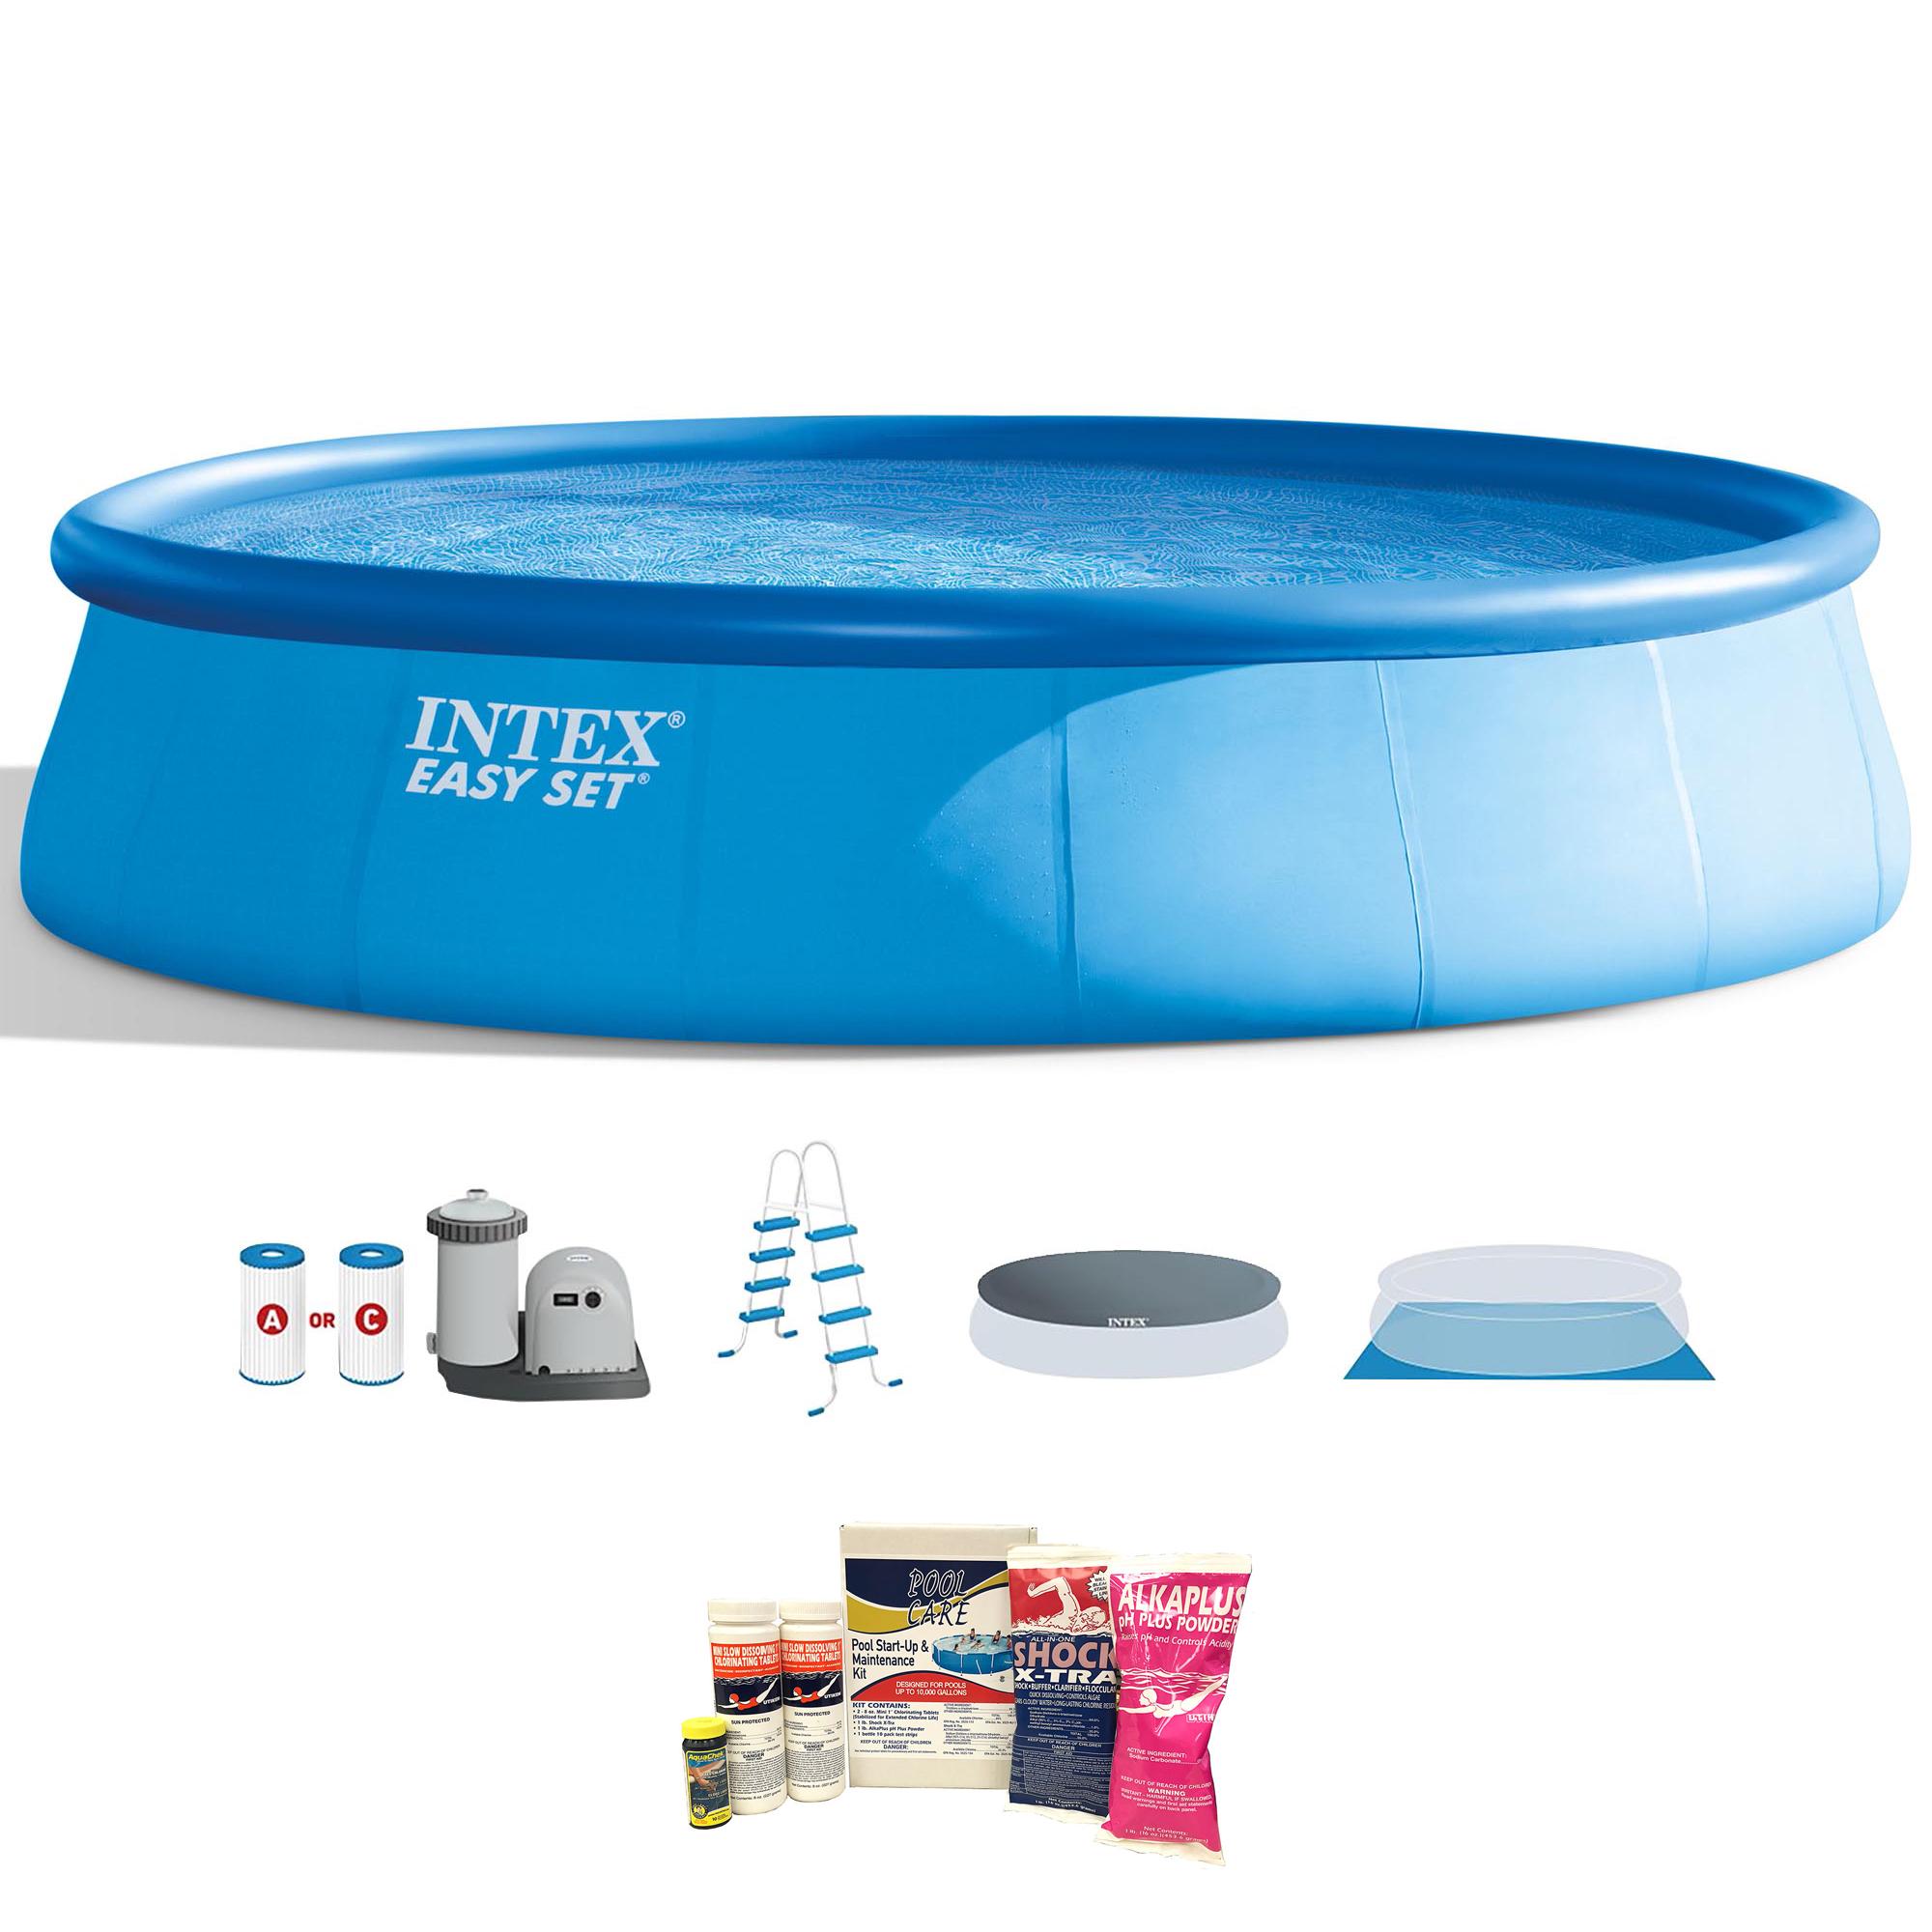 Intex 18 X 4 Foot Inflatable Easy Set Pool W Ladder Pump